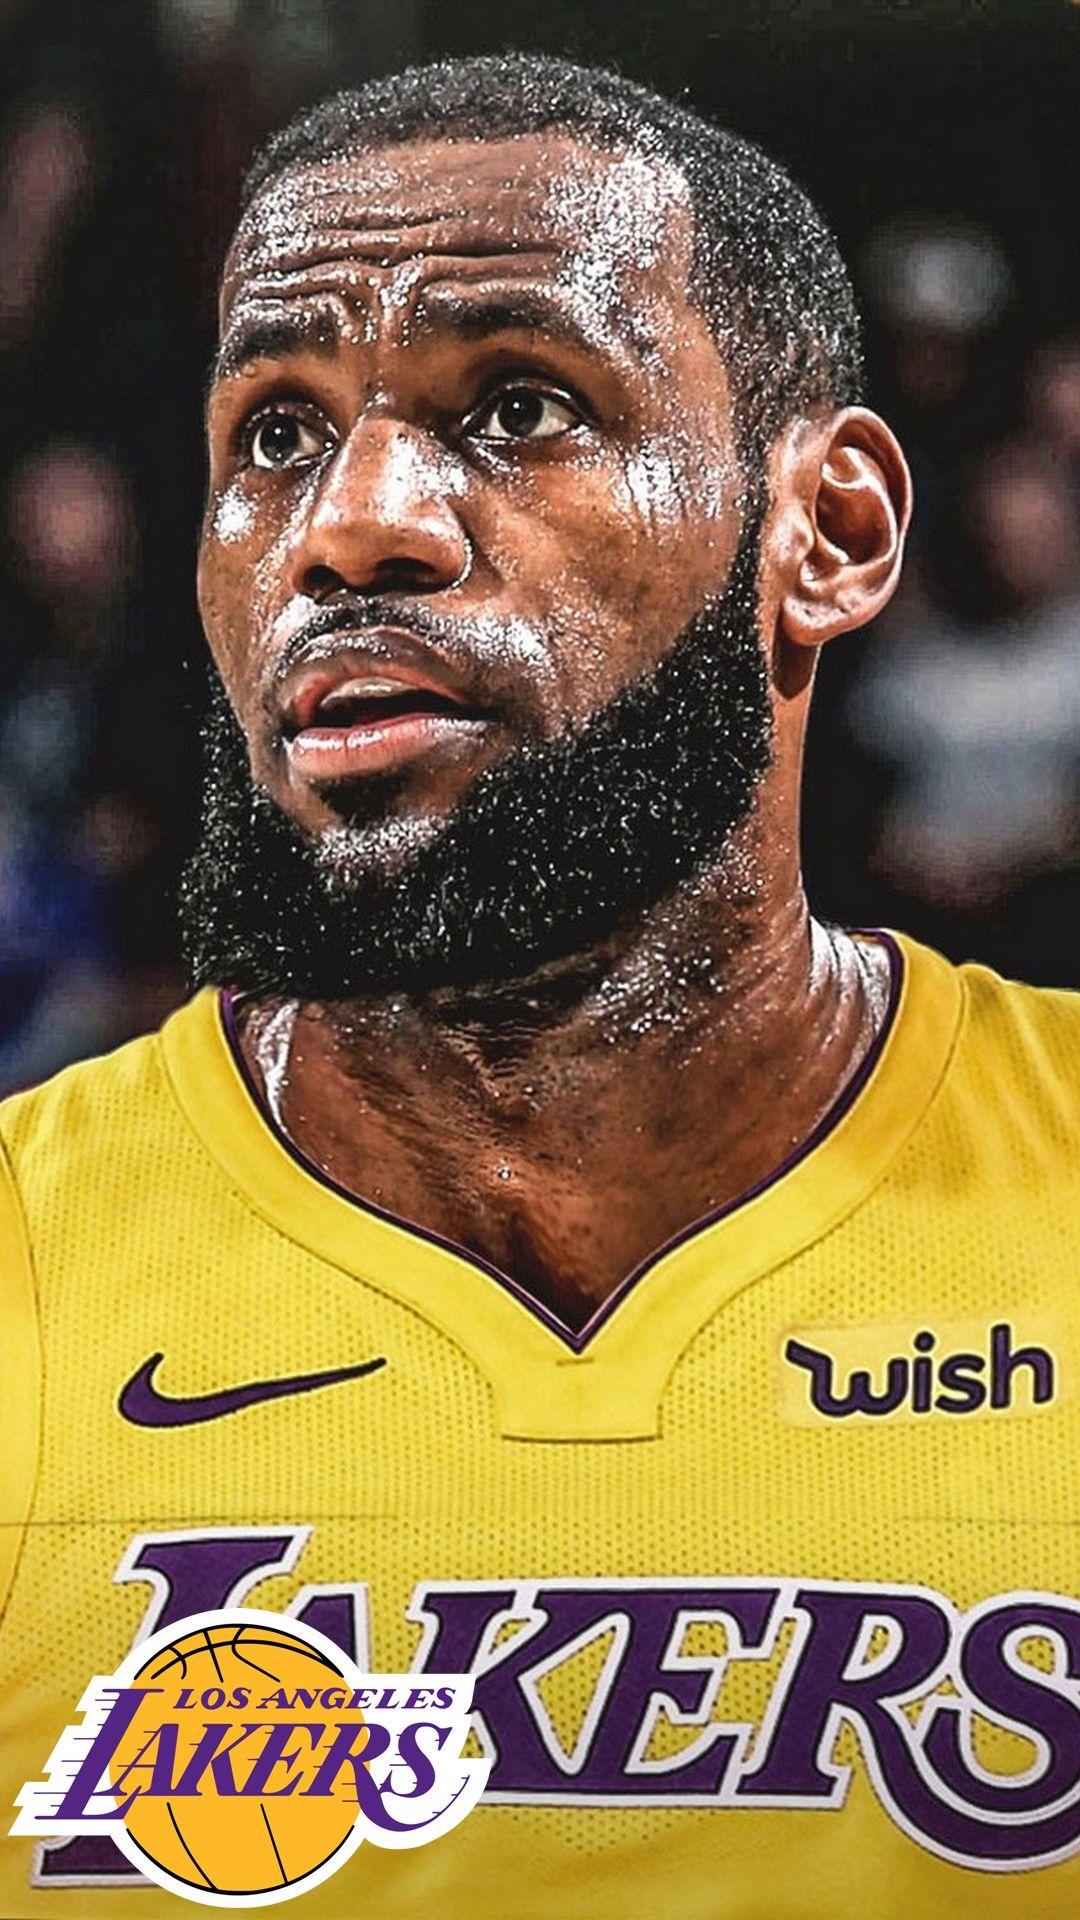 LA Lakers LeBron James iPhone 7 Plus Wallpaper Iphone 7